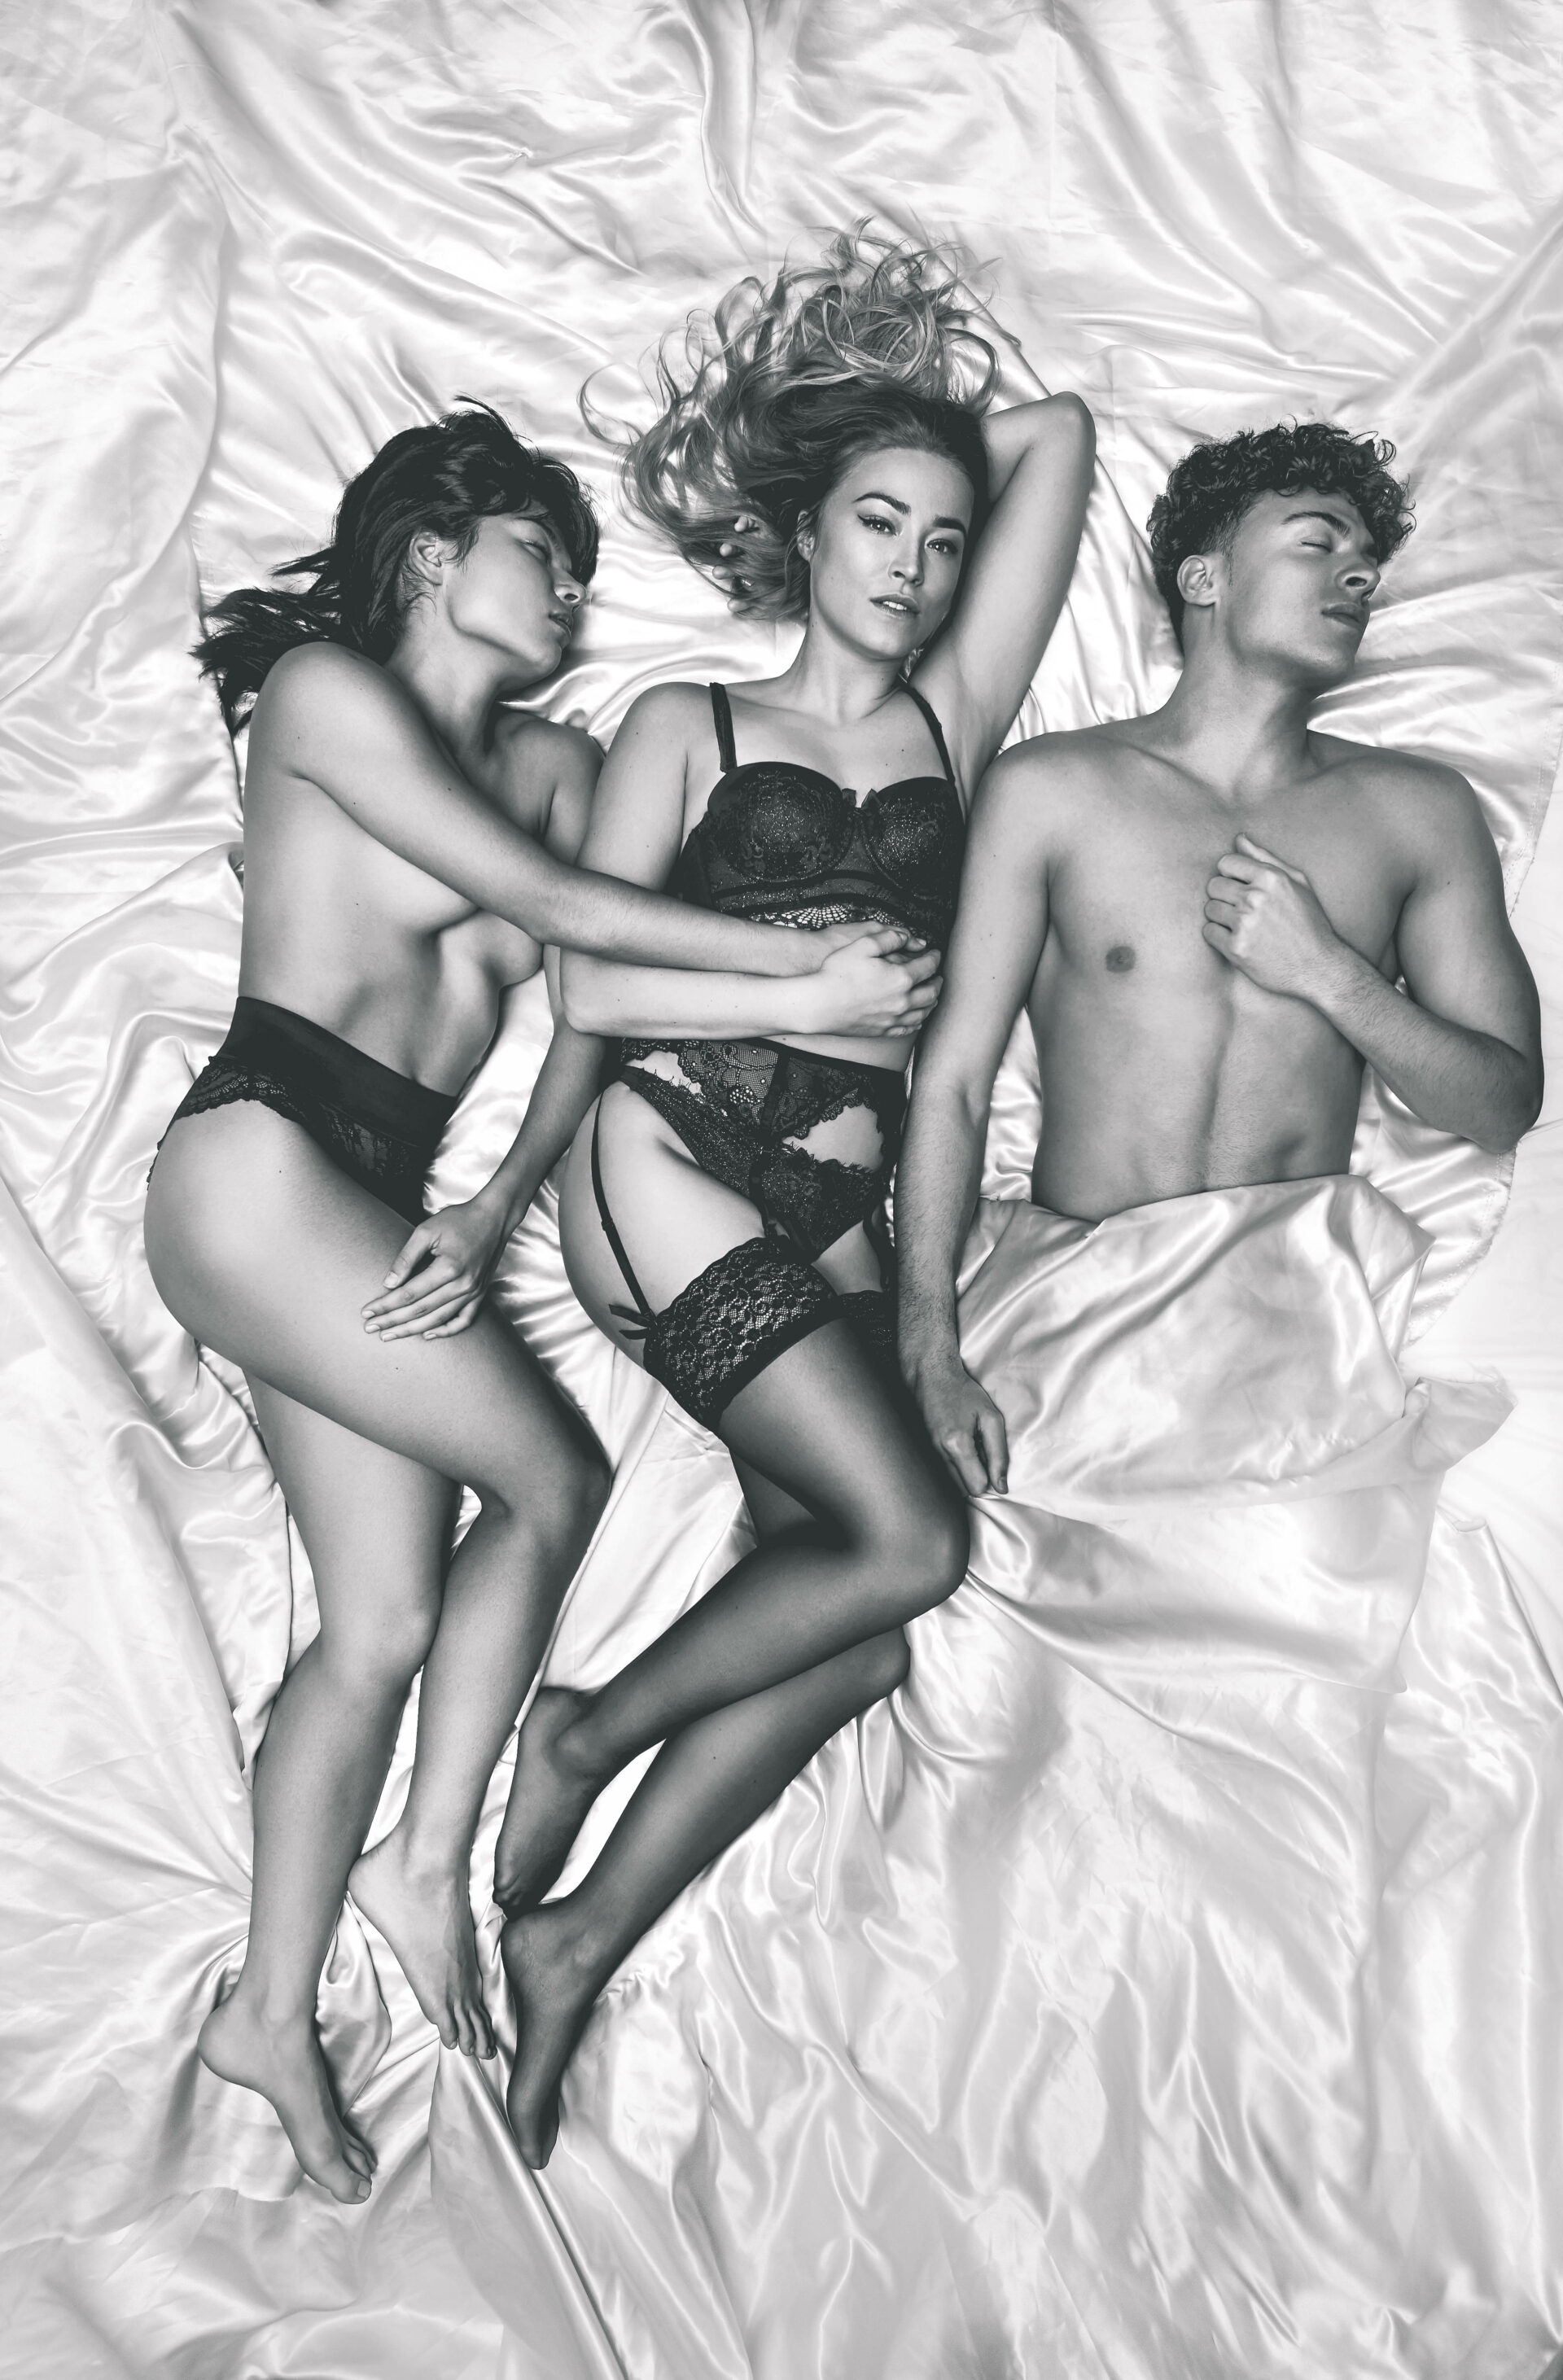 Geraldine Kemper, van gils, campagne, topless